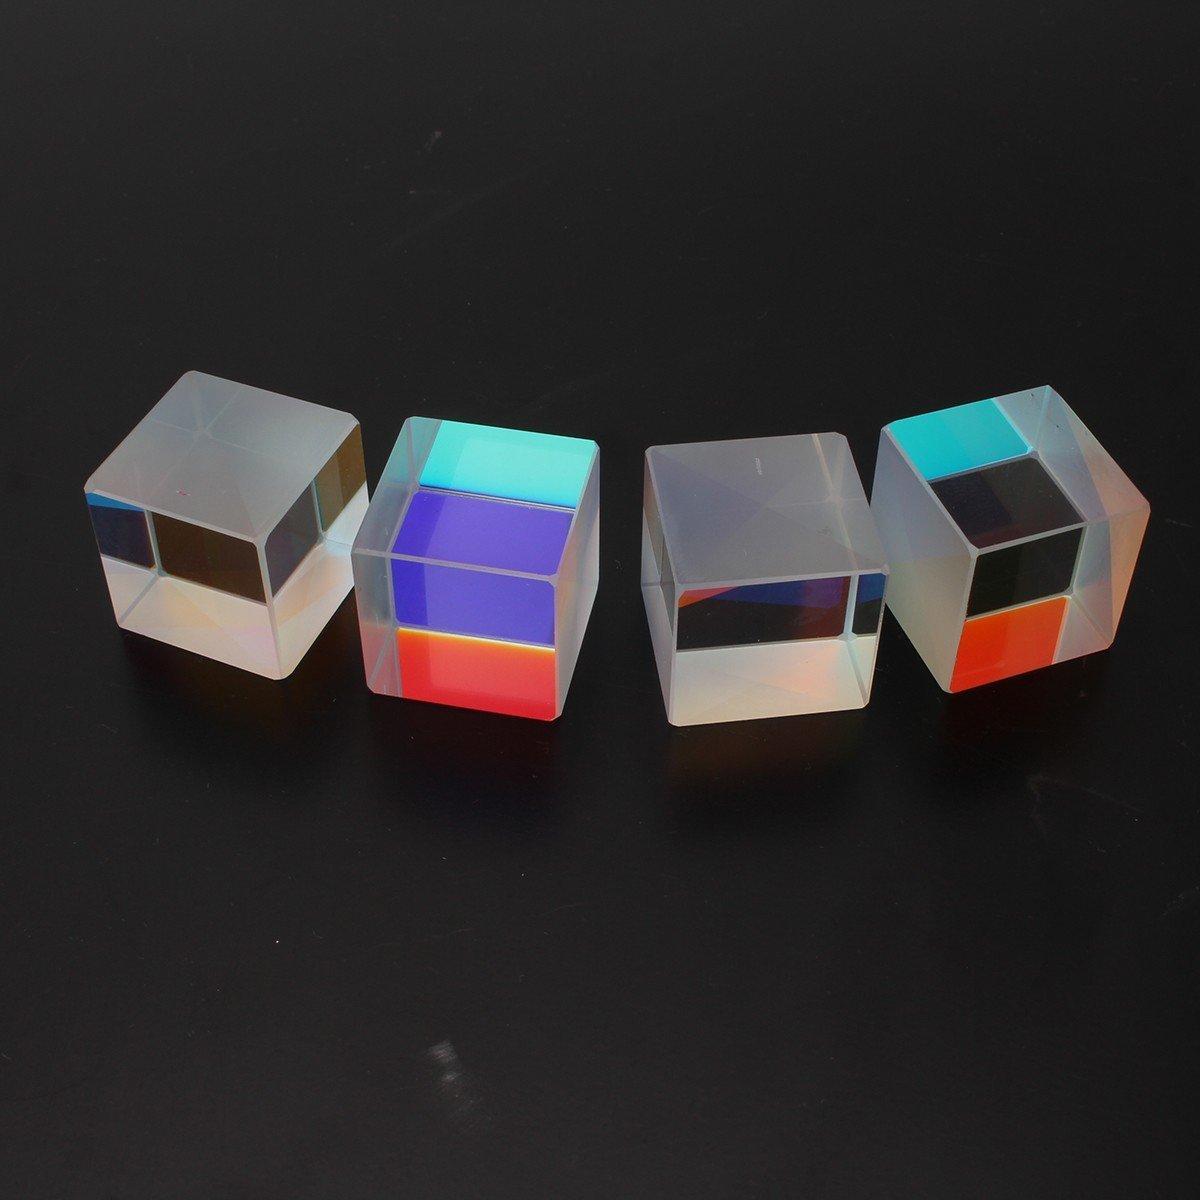 4pcs Cube Prism Optical RGB Combiner Splitter Physics Science Lab Teaching Instrument